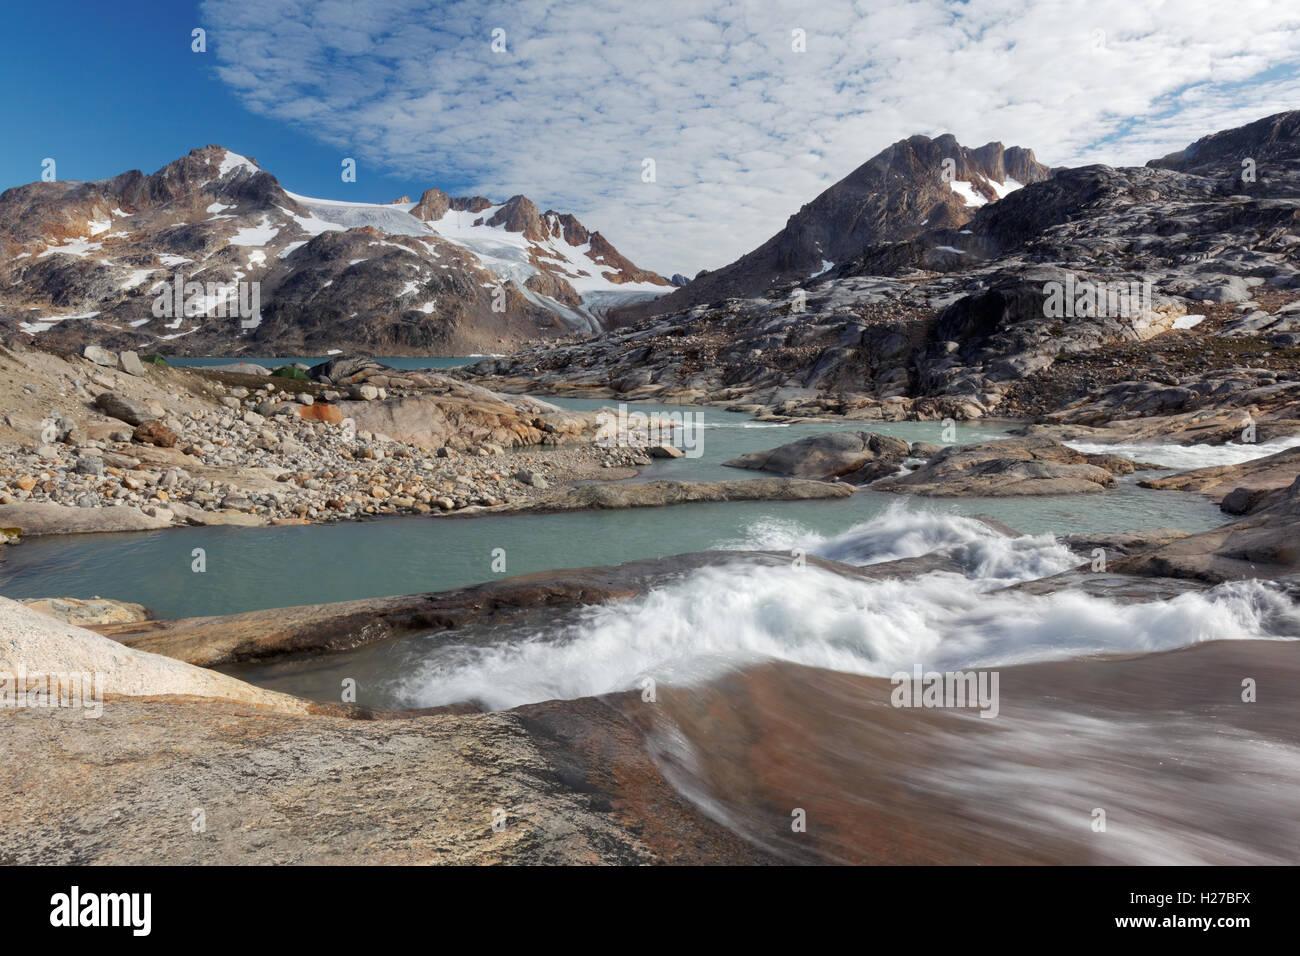 Glacial melt river and mountains, Sammileq Fjord, Ammassalik Island, East Greenland - Stock Image